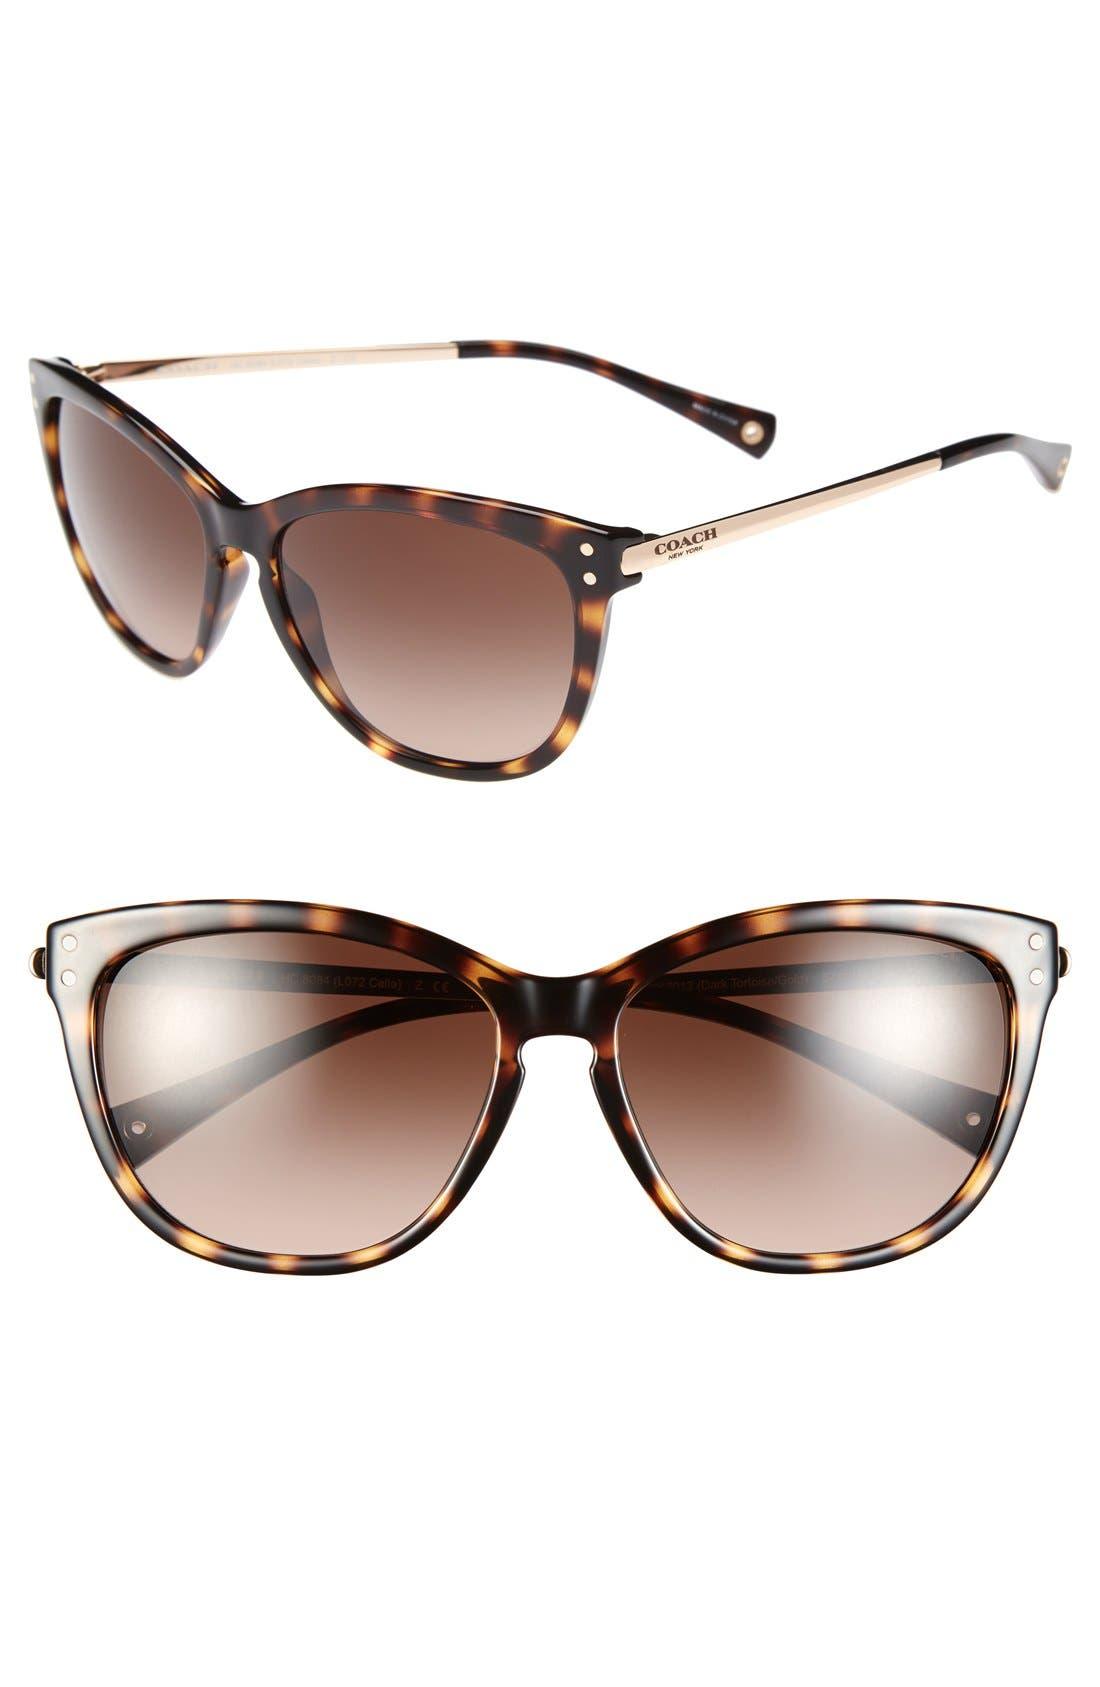 Alternate Image 1 Selected - COACH 'Celia' 57mm Cat Eye Sunglasses